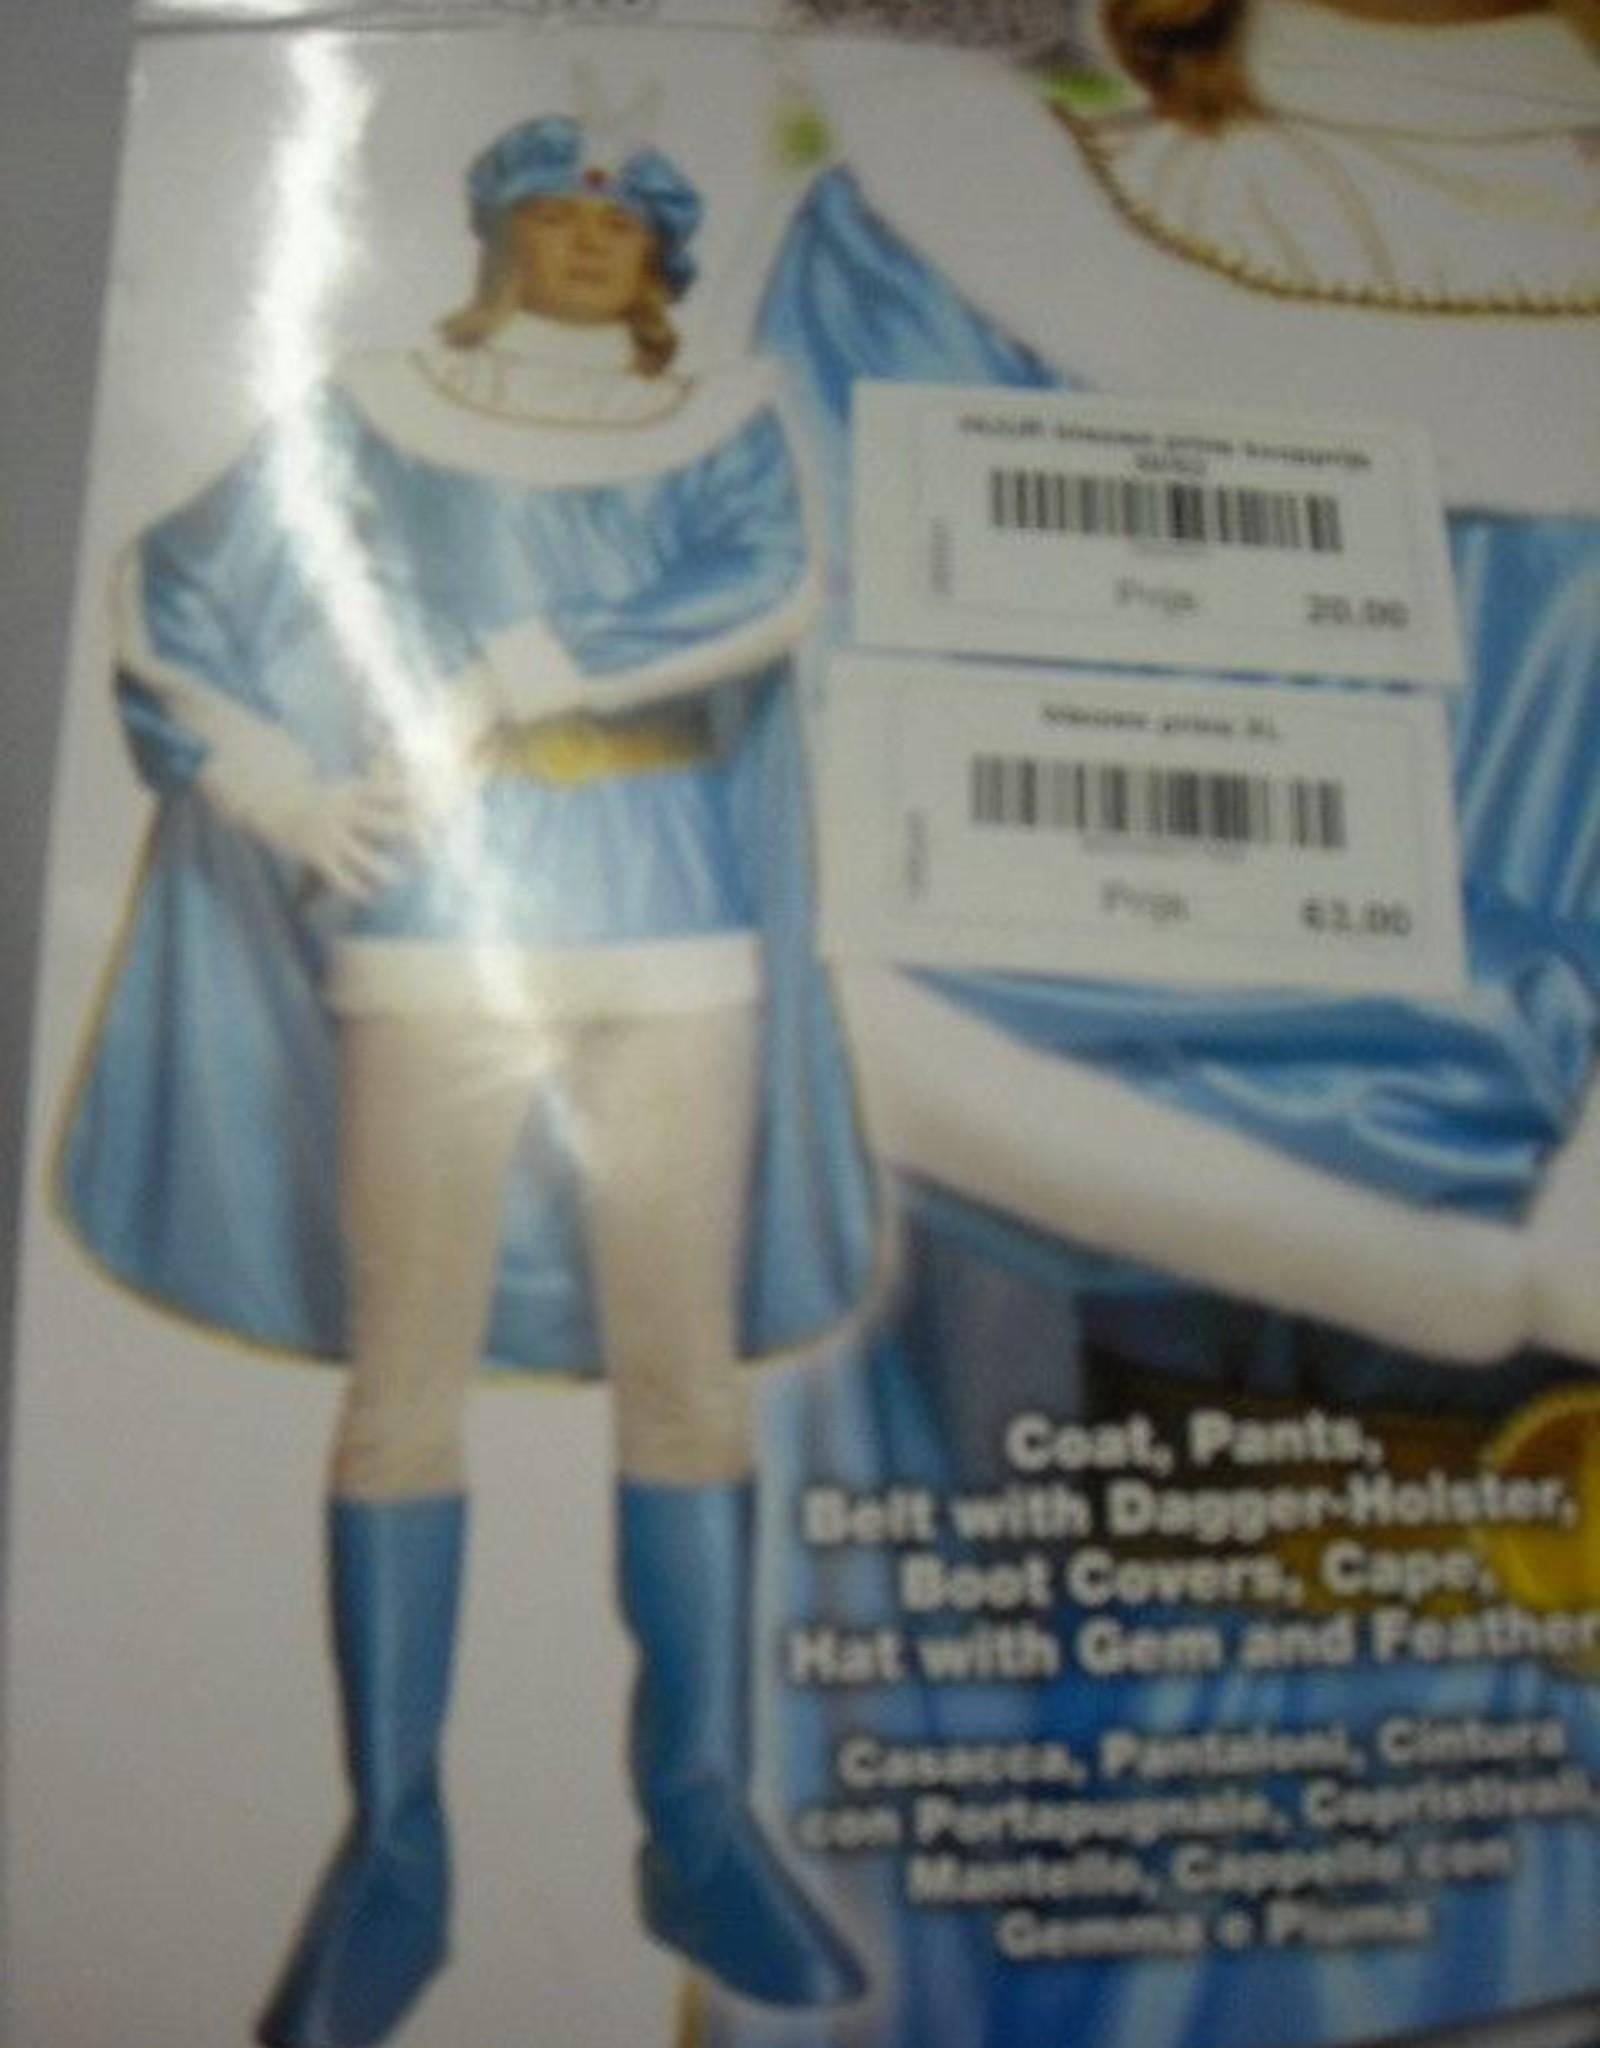 Cremers blauwe prins XL huurprijs € 20